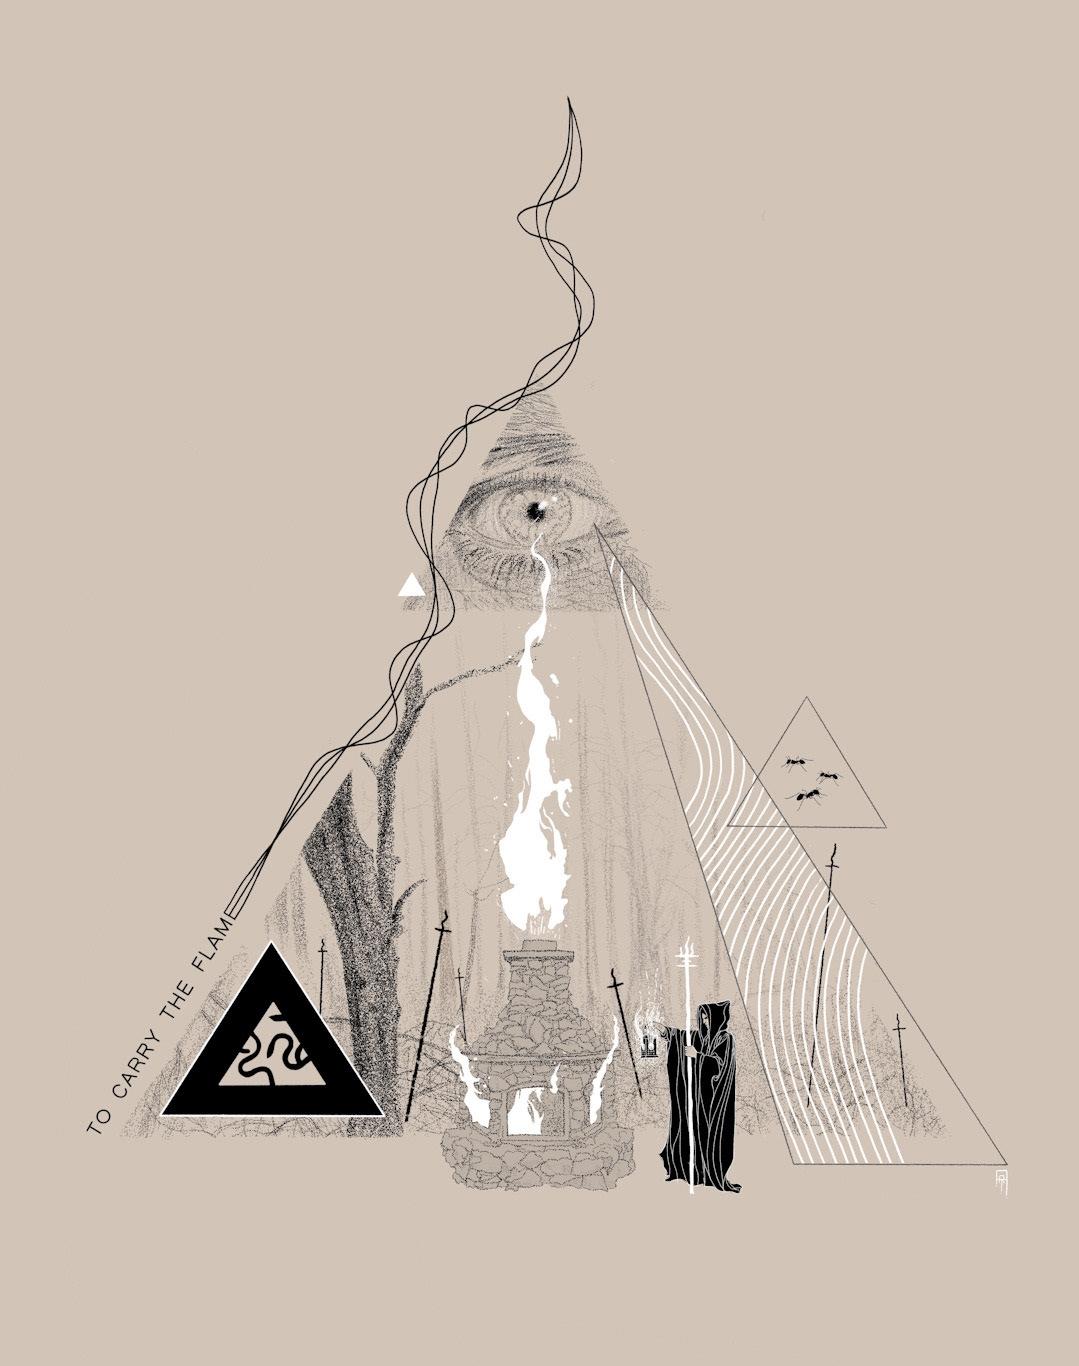 Carry Flame - Beltane, pagan, paganism - adamrobertmartin | ello